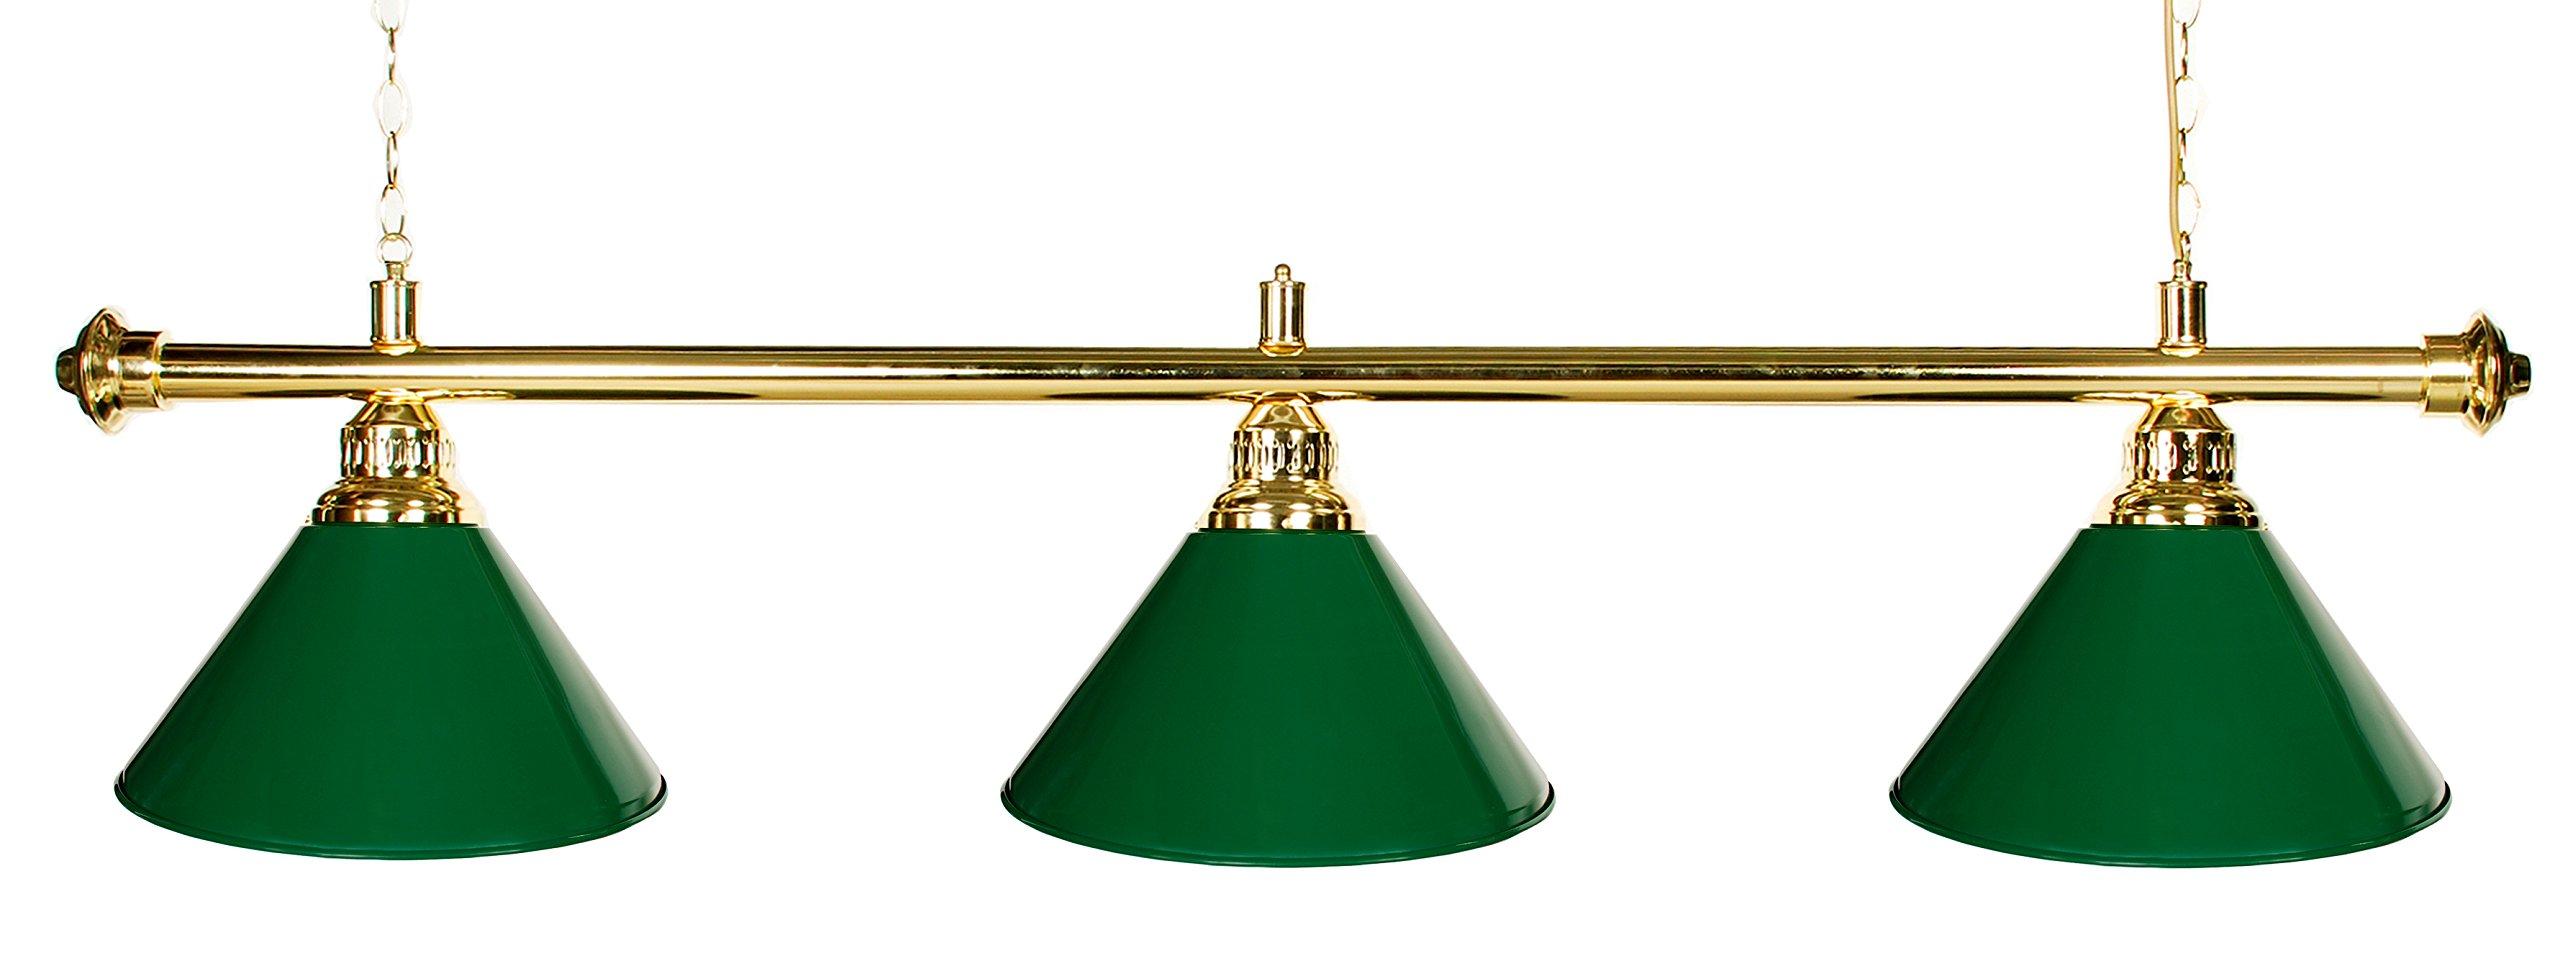 "61"" Pool Table Light - Billiard Lamp Brass Rod Choose Burgandy, Green or Black Metal Shades (brass green)"